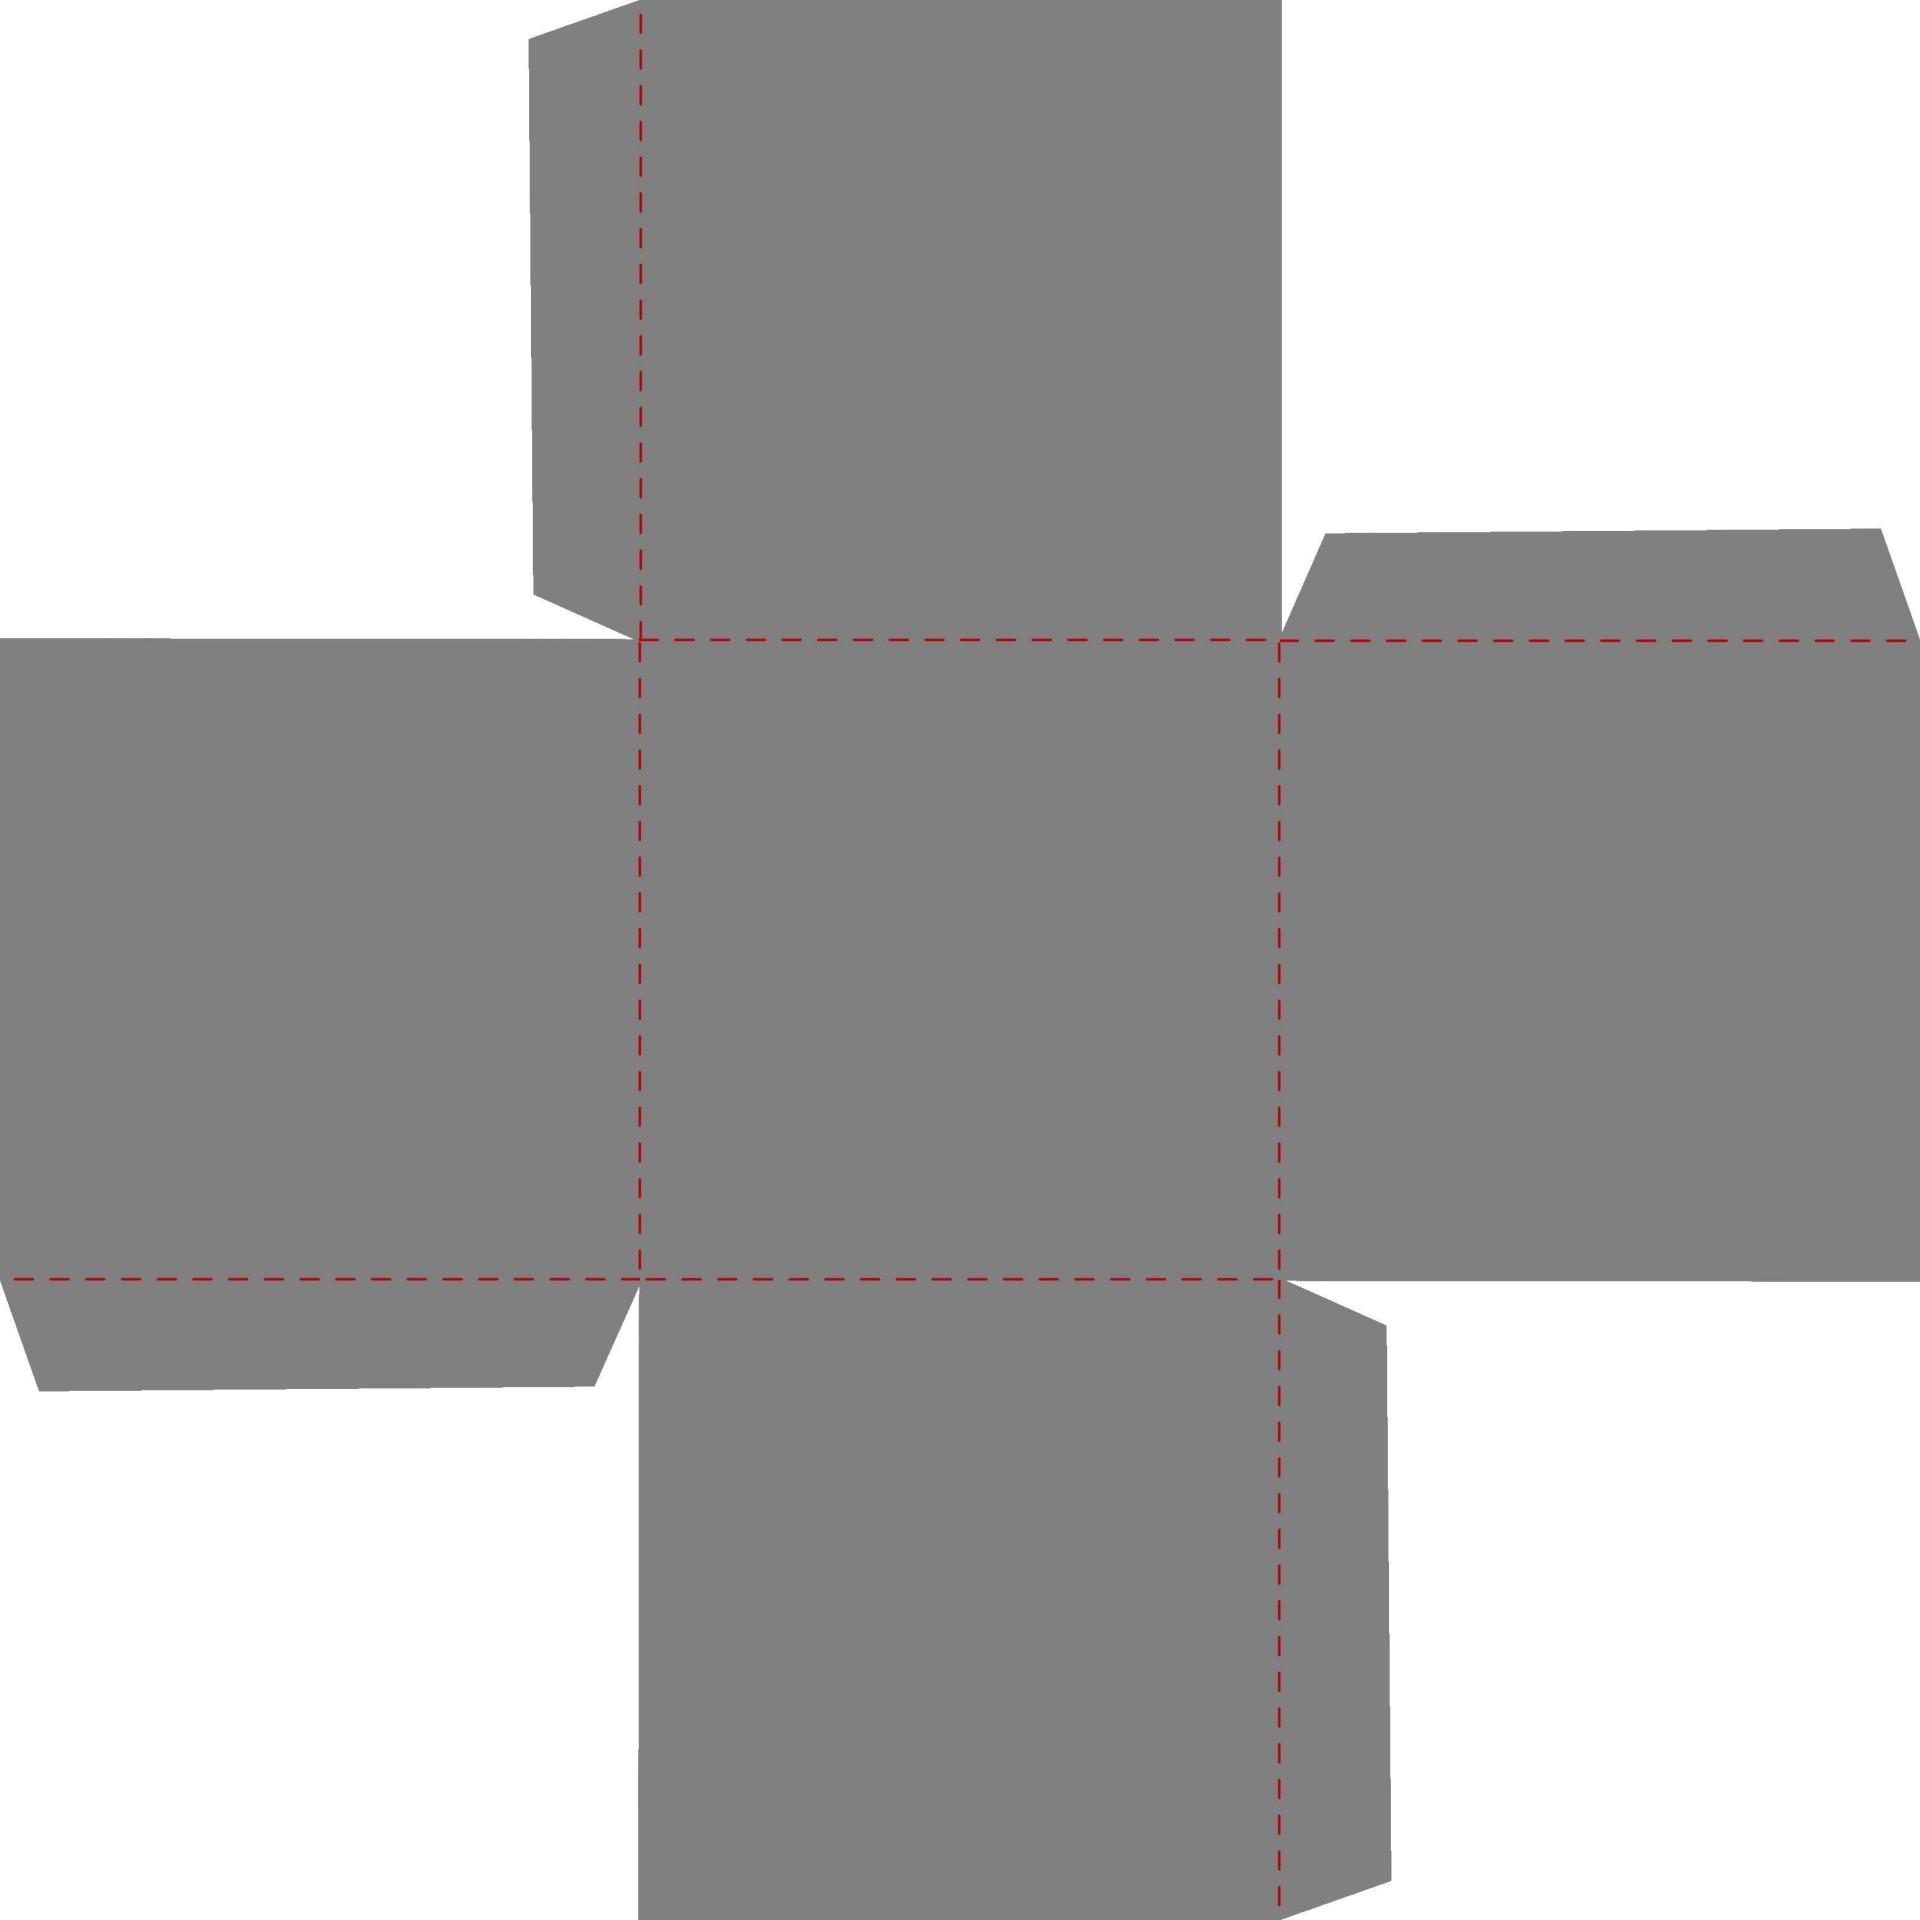 006 Stirring Square Box Template Free Printable Idea 1920